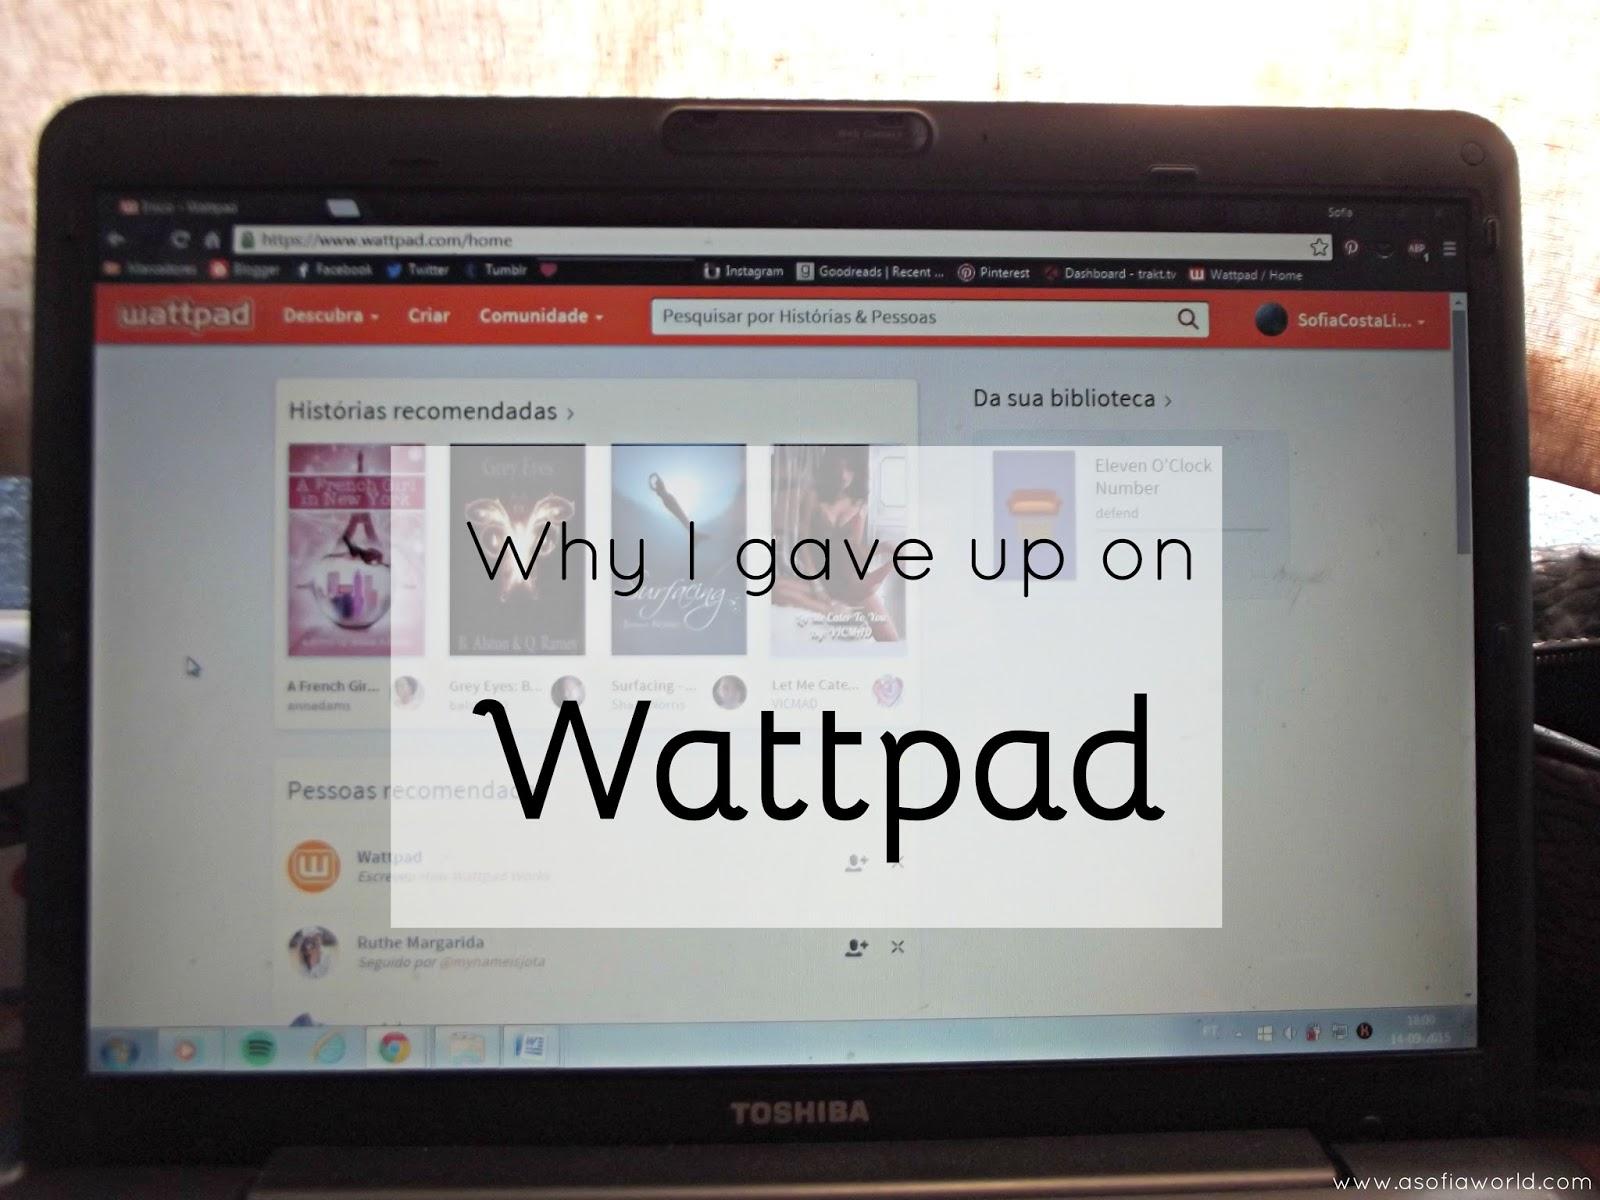 Why I gave up on Wattpad